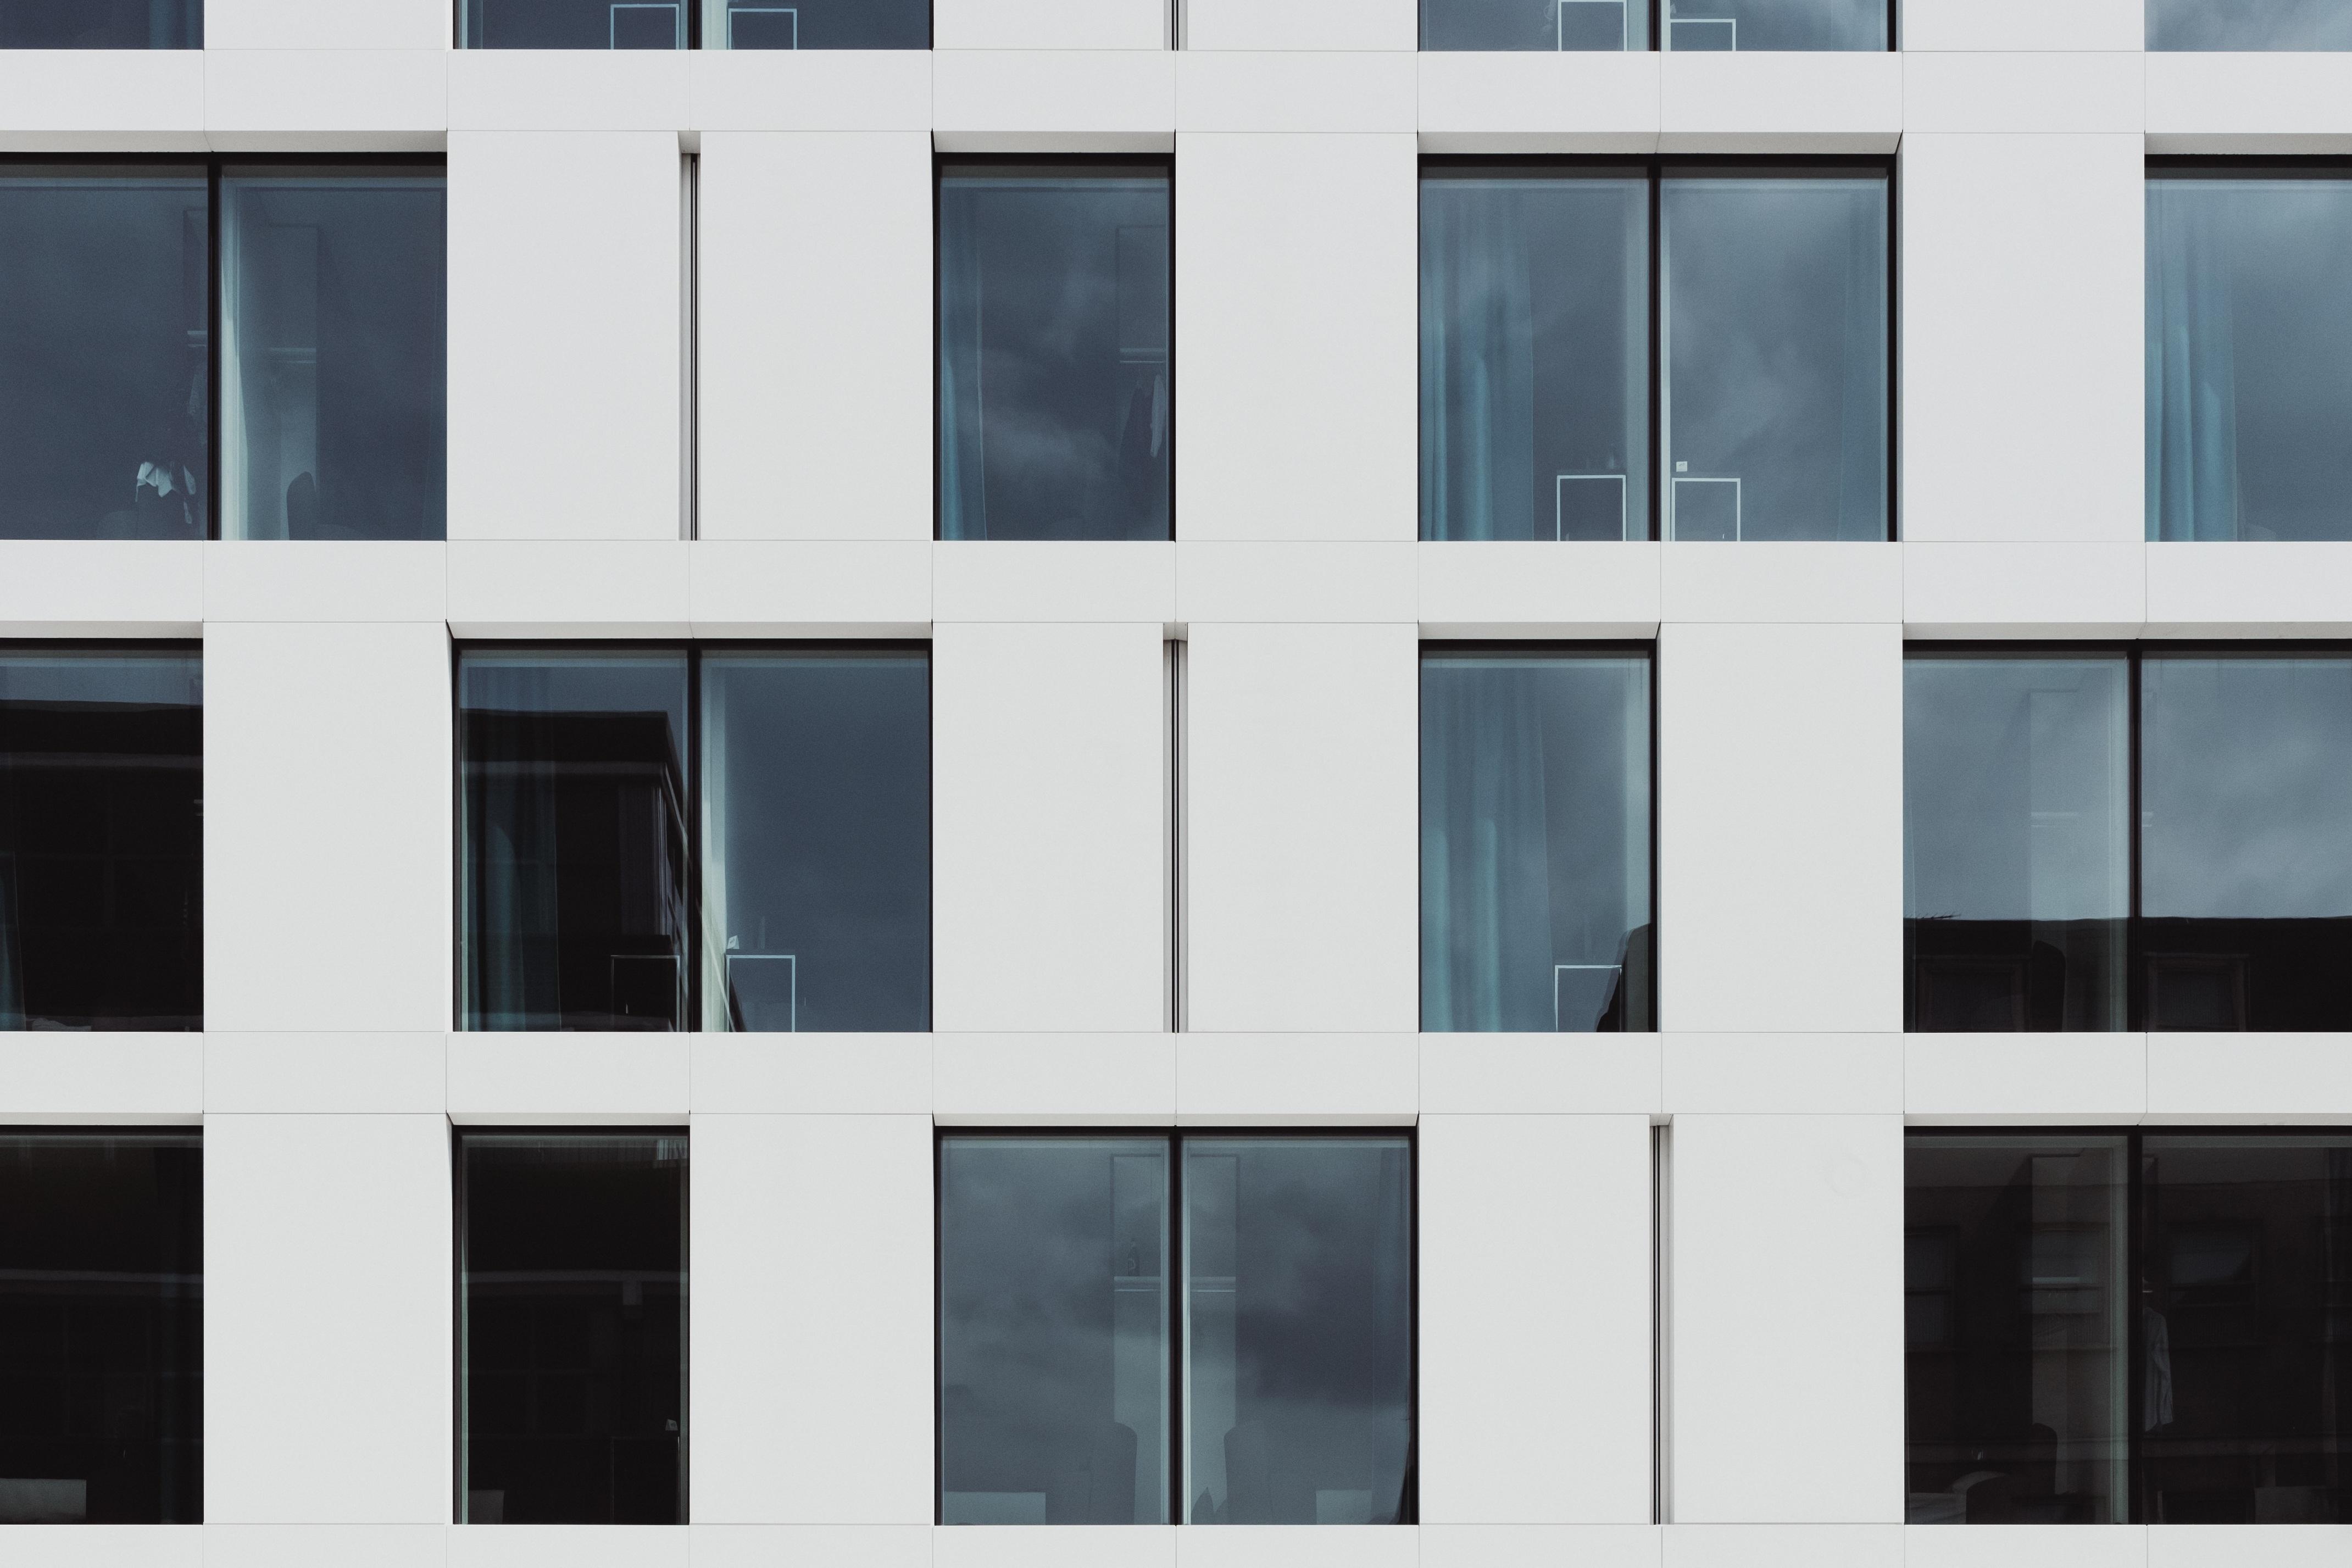 Fotos gratis arquitectura ventana vaso urbano l nea for Diseno de interiores diseno contemporaneo